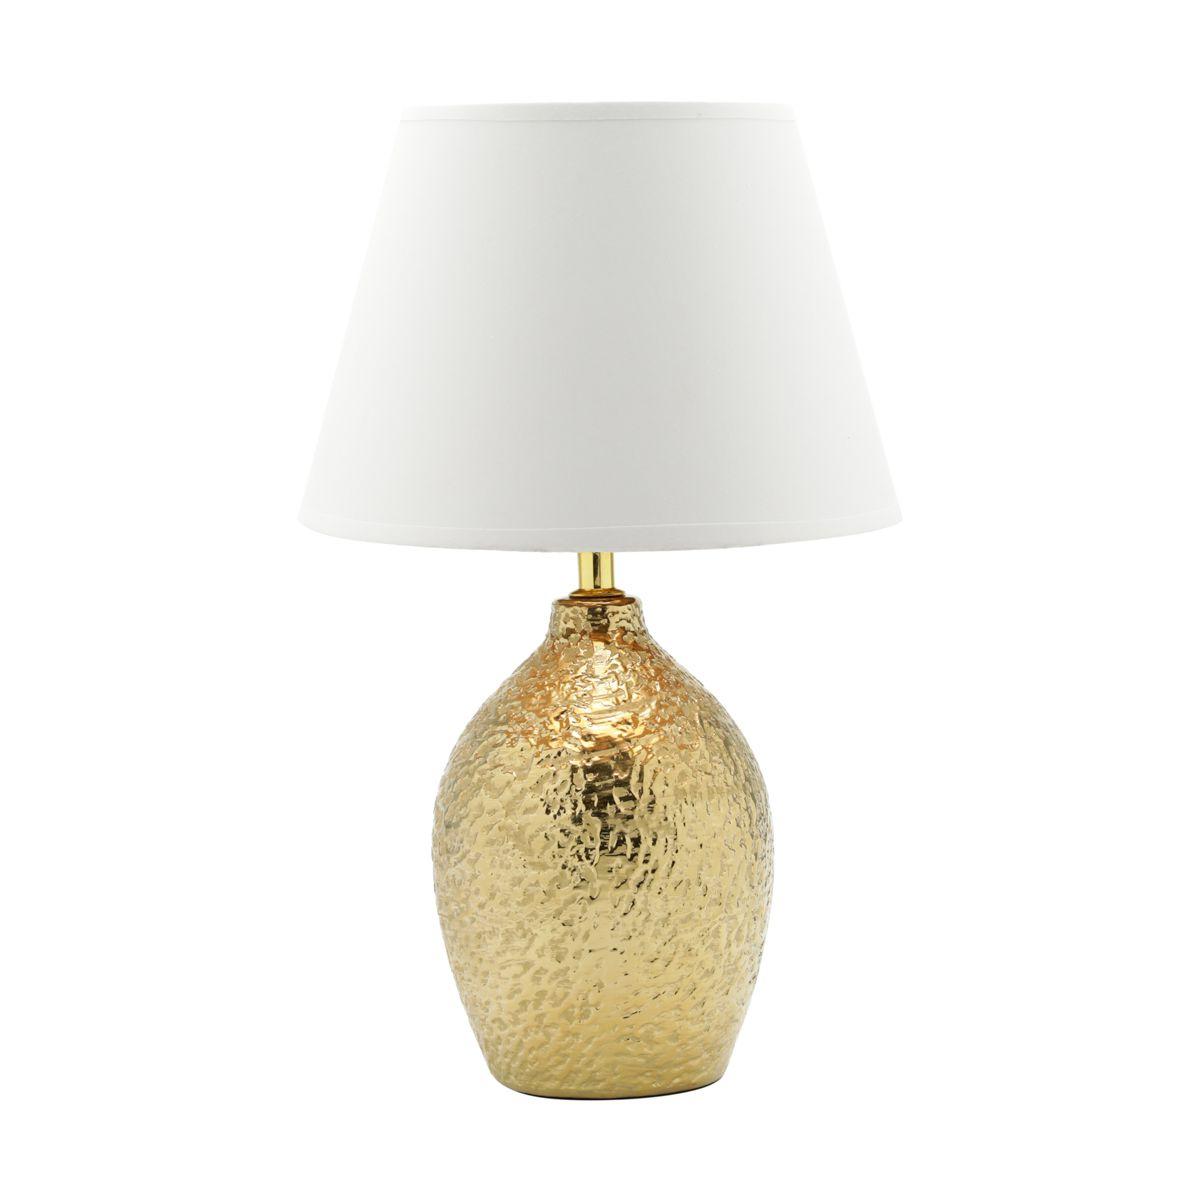 Abajur 41 cm de cerâmica dourado e cúpula branca Bivolt Royal - 60561